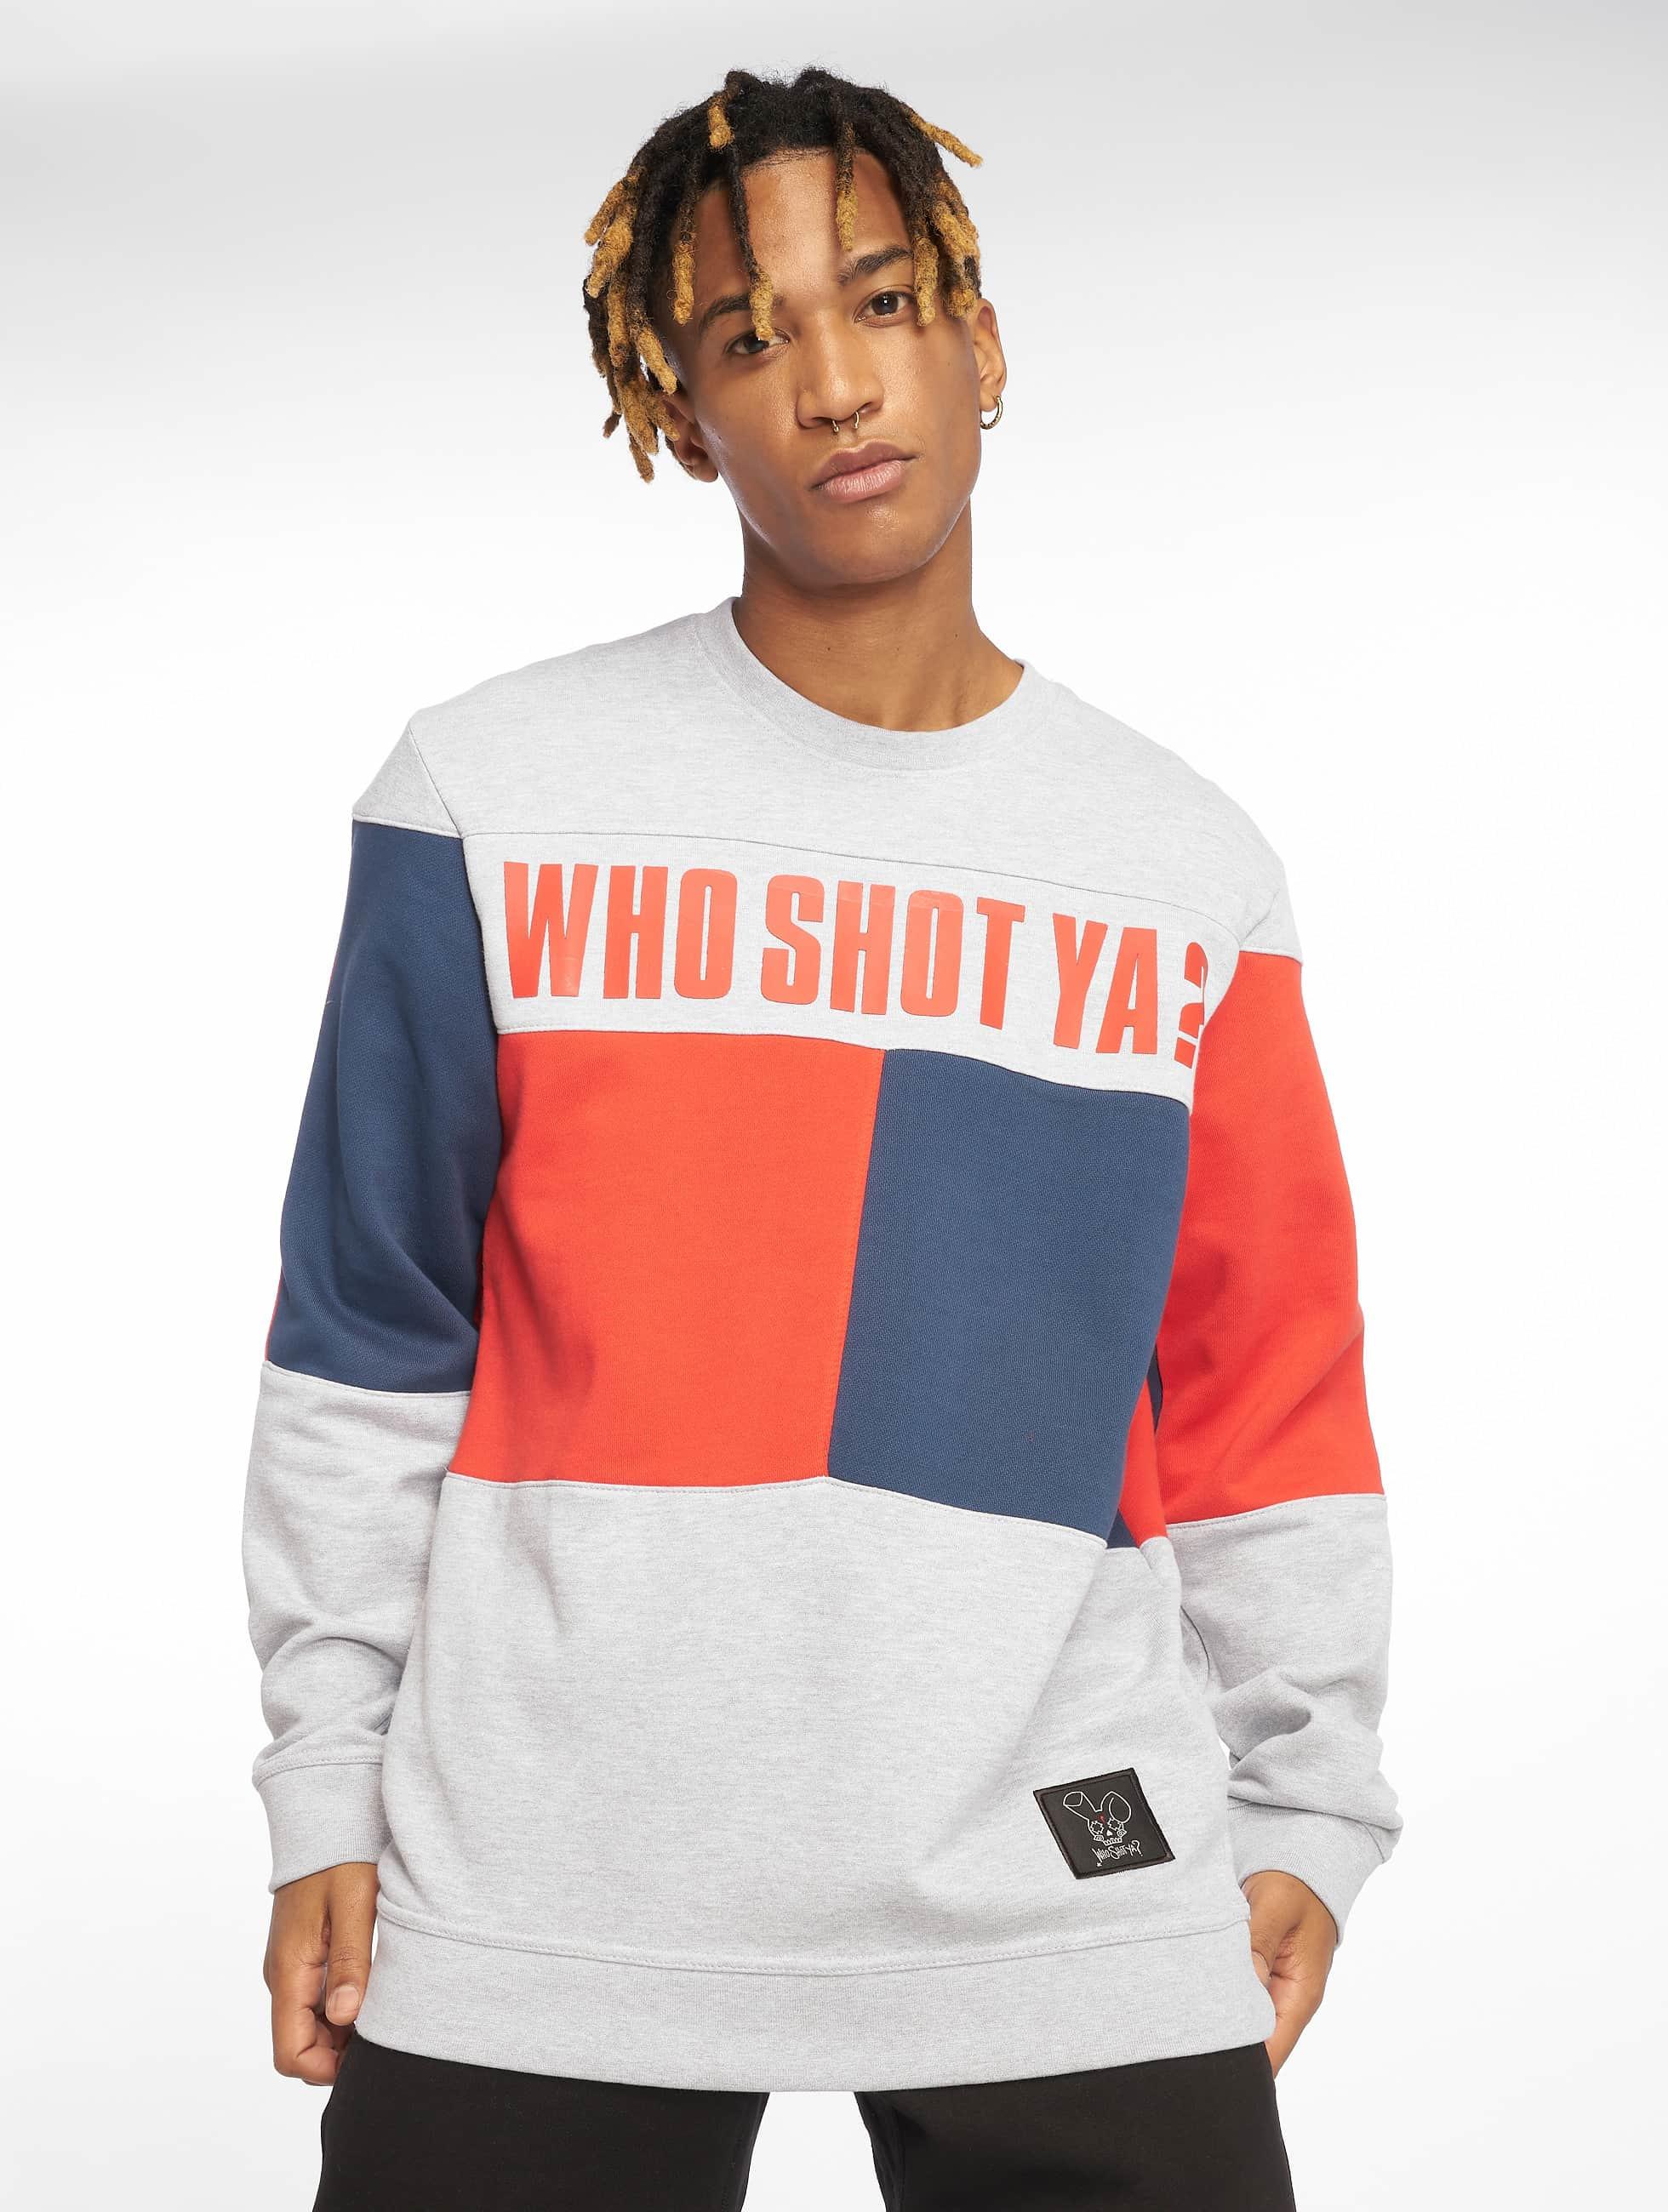 Who Shot Ya? / Jumper Block in grey XL